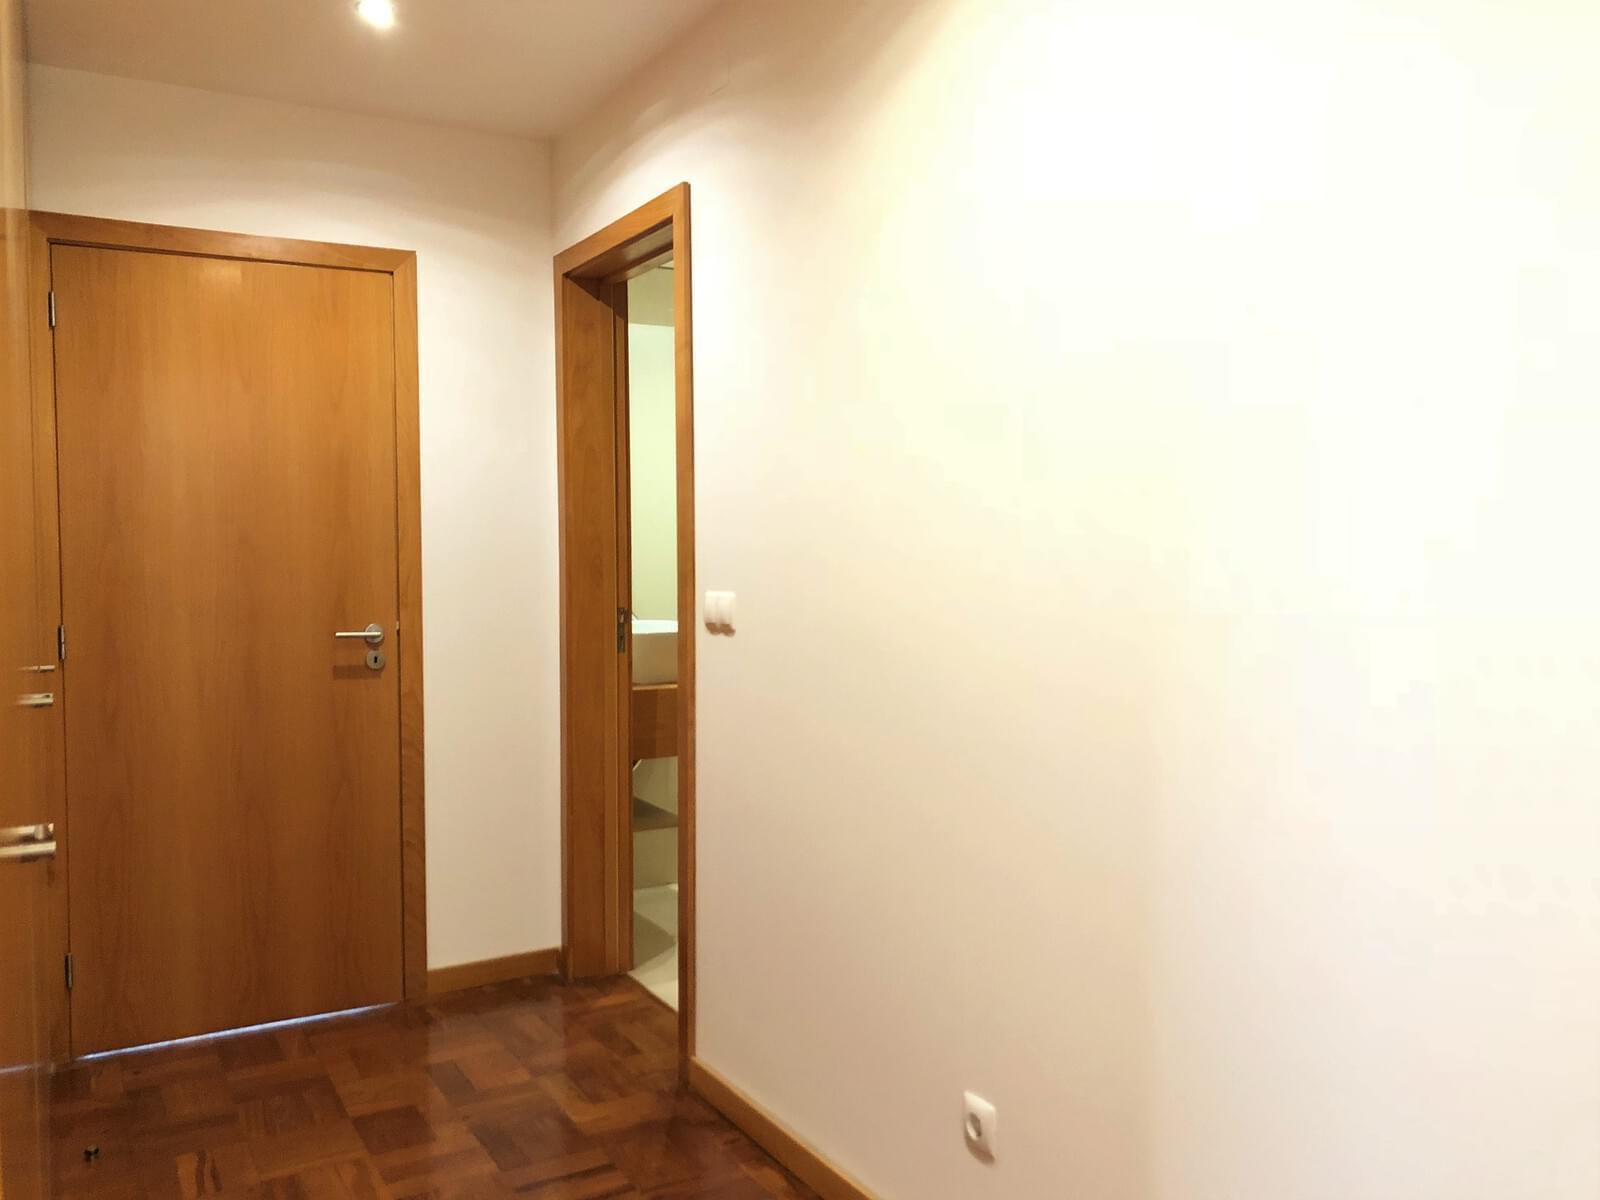 pf18040-apartamento-t3-lisboa-24188c4e-6bc0-478b-a28a-e9a61db1c213